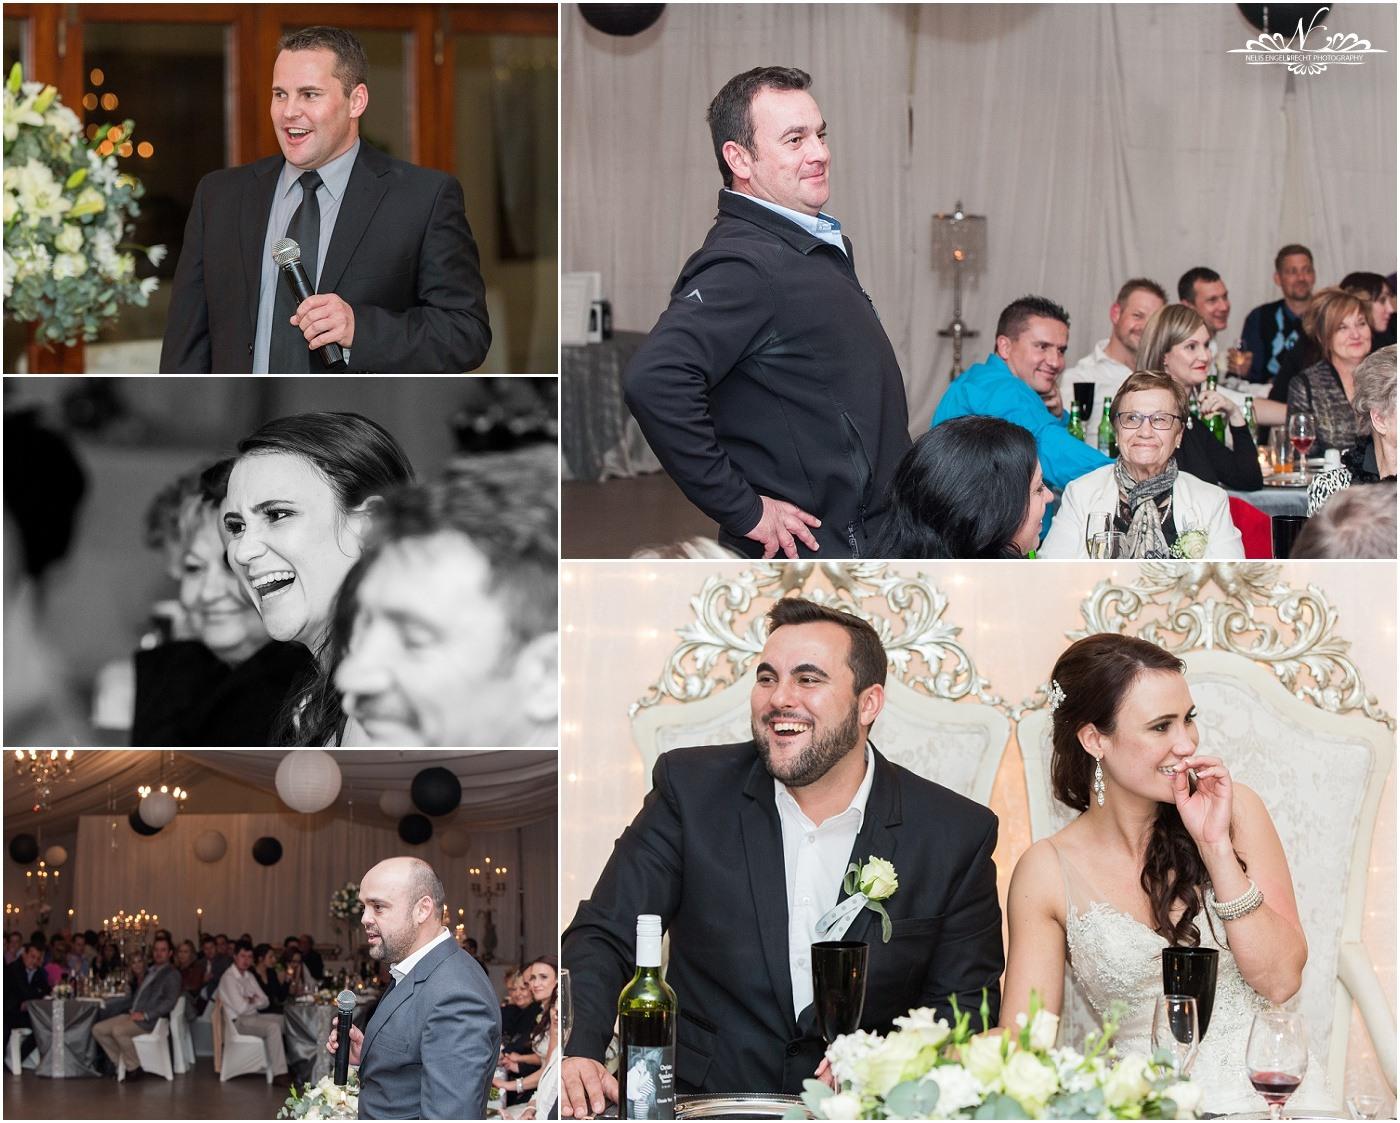 Eensgezind-Wedding-Photos-Nelis-Engelbrecht-Photography-181